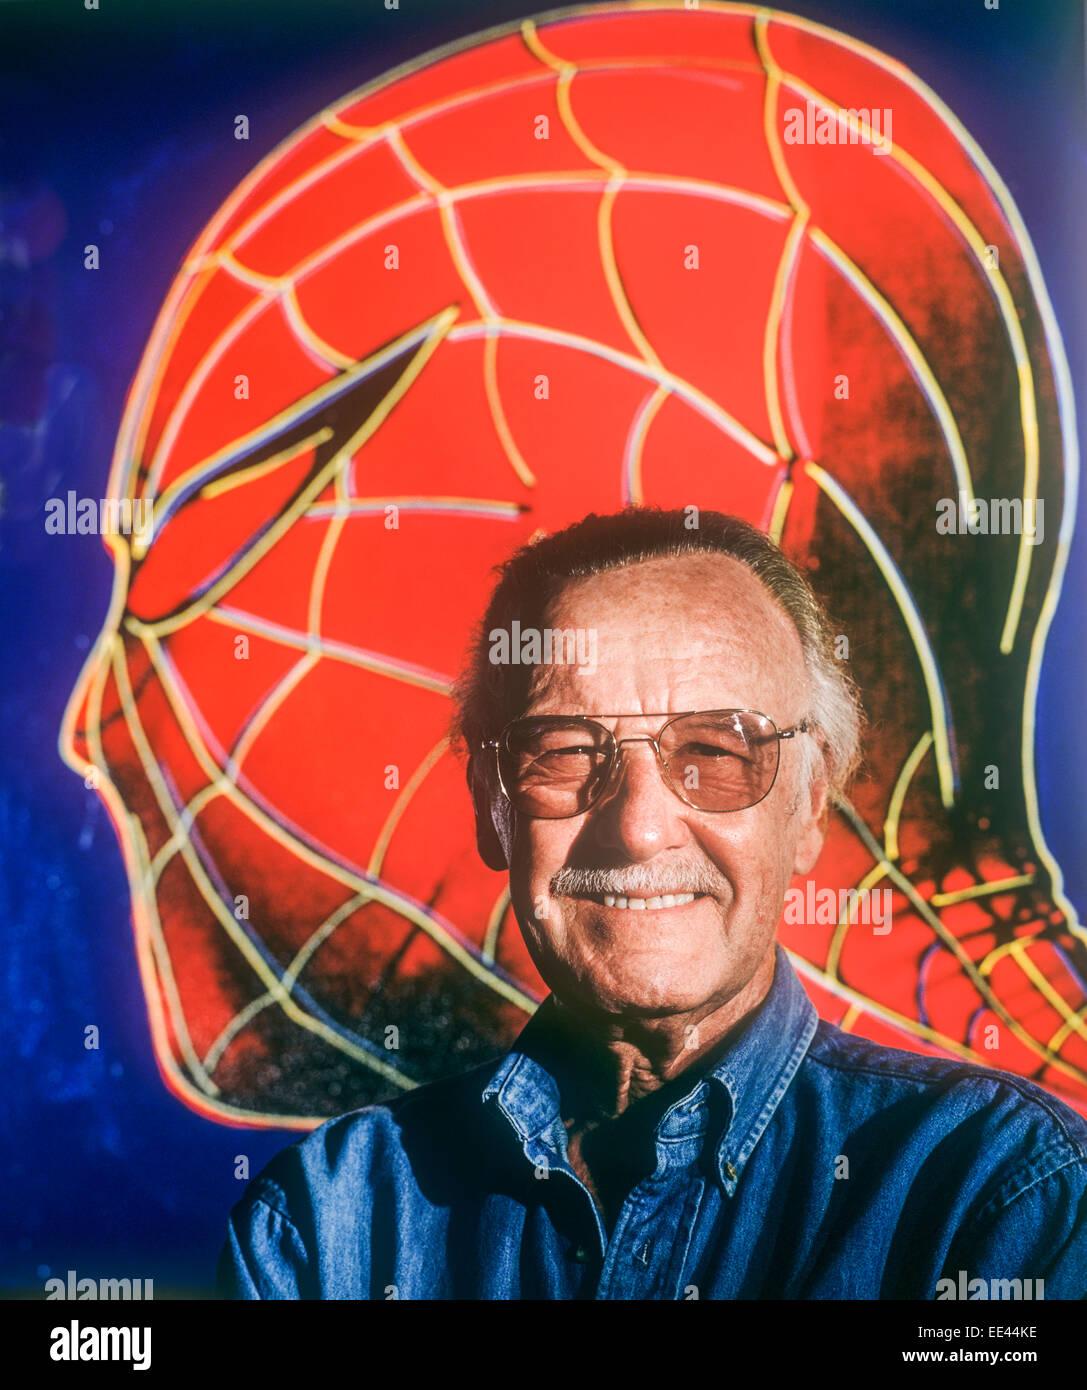 LOS ANGELES, CA - JUNE 6: Comic book illustrator and creator Stan Lee in Los Angeles, California on June 6, 1996. - Stock Image